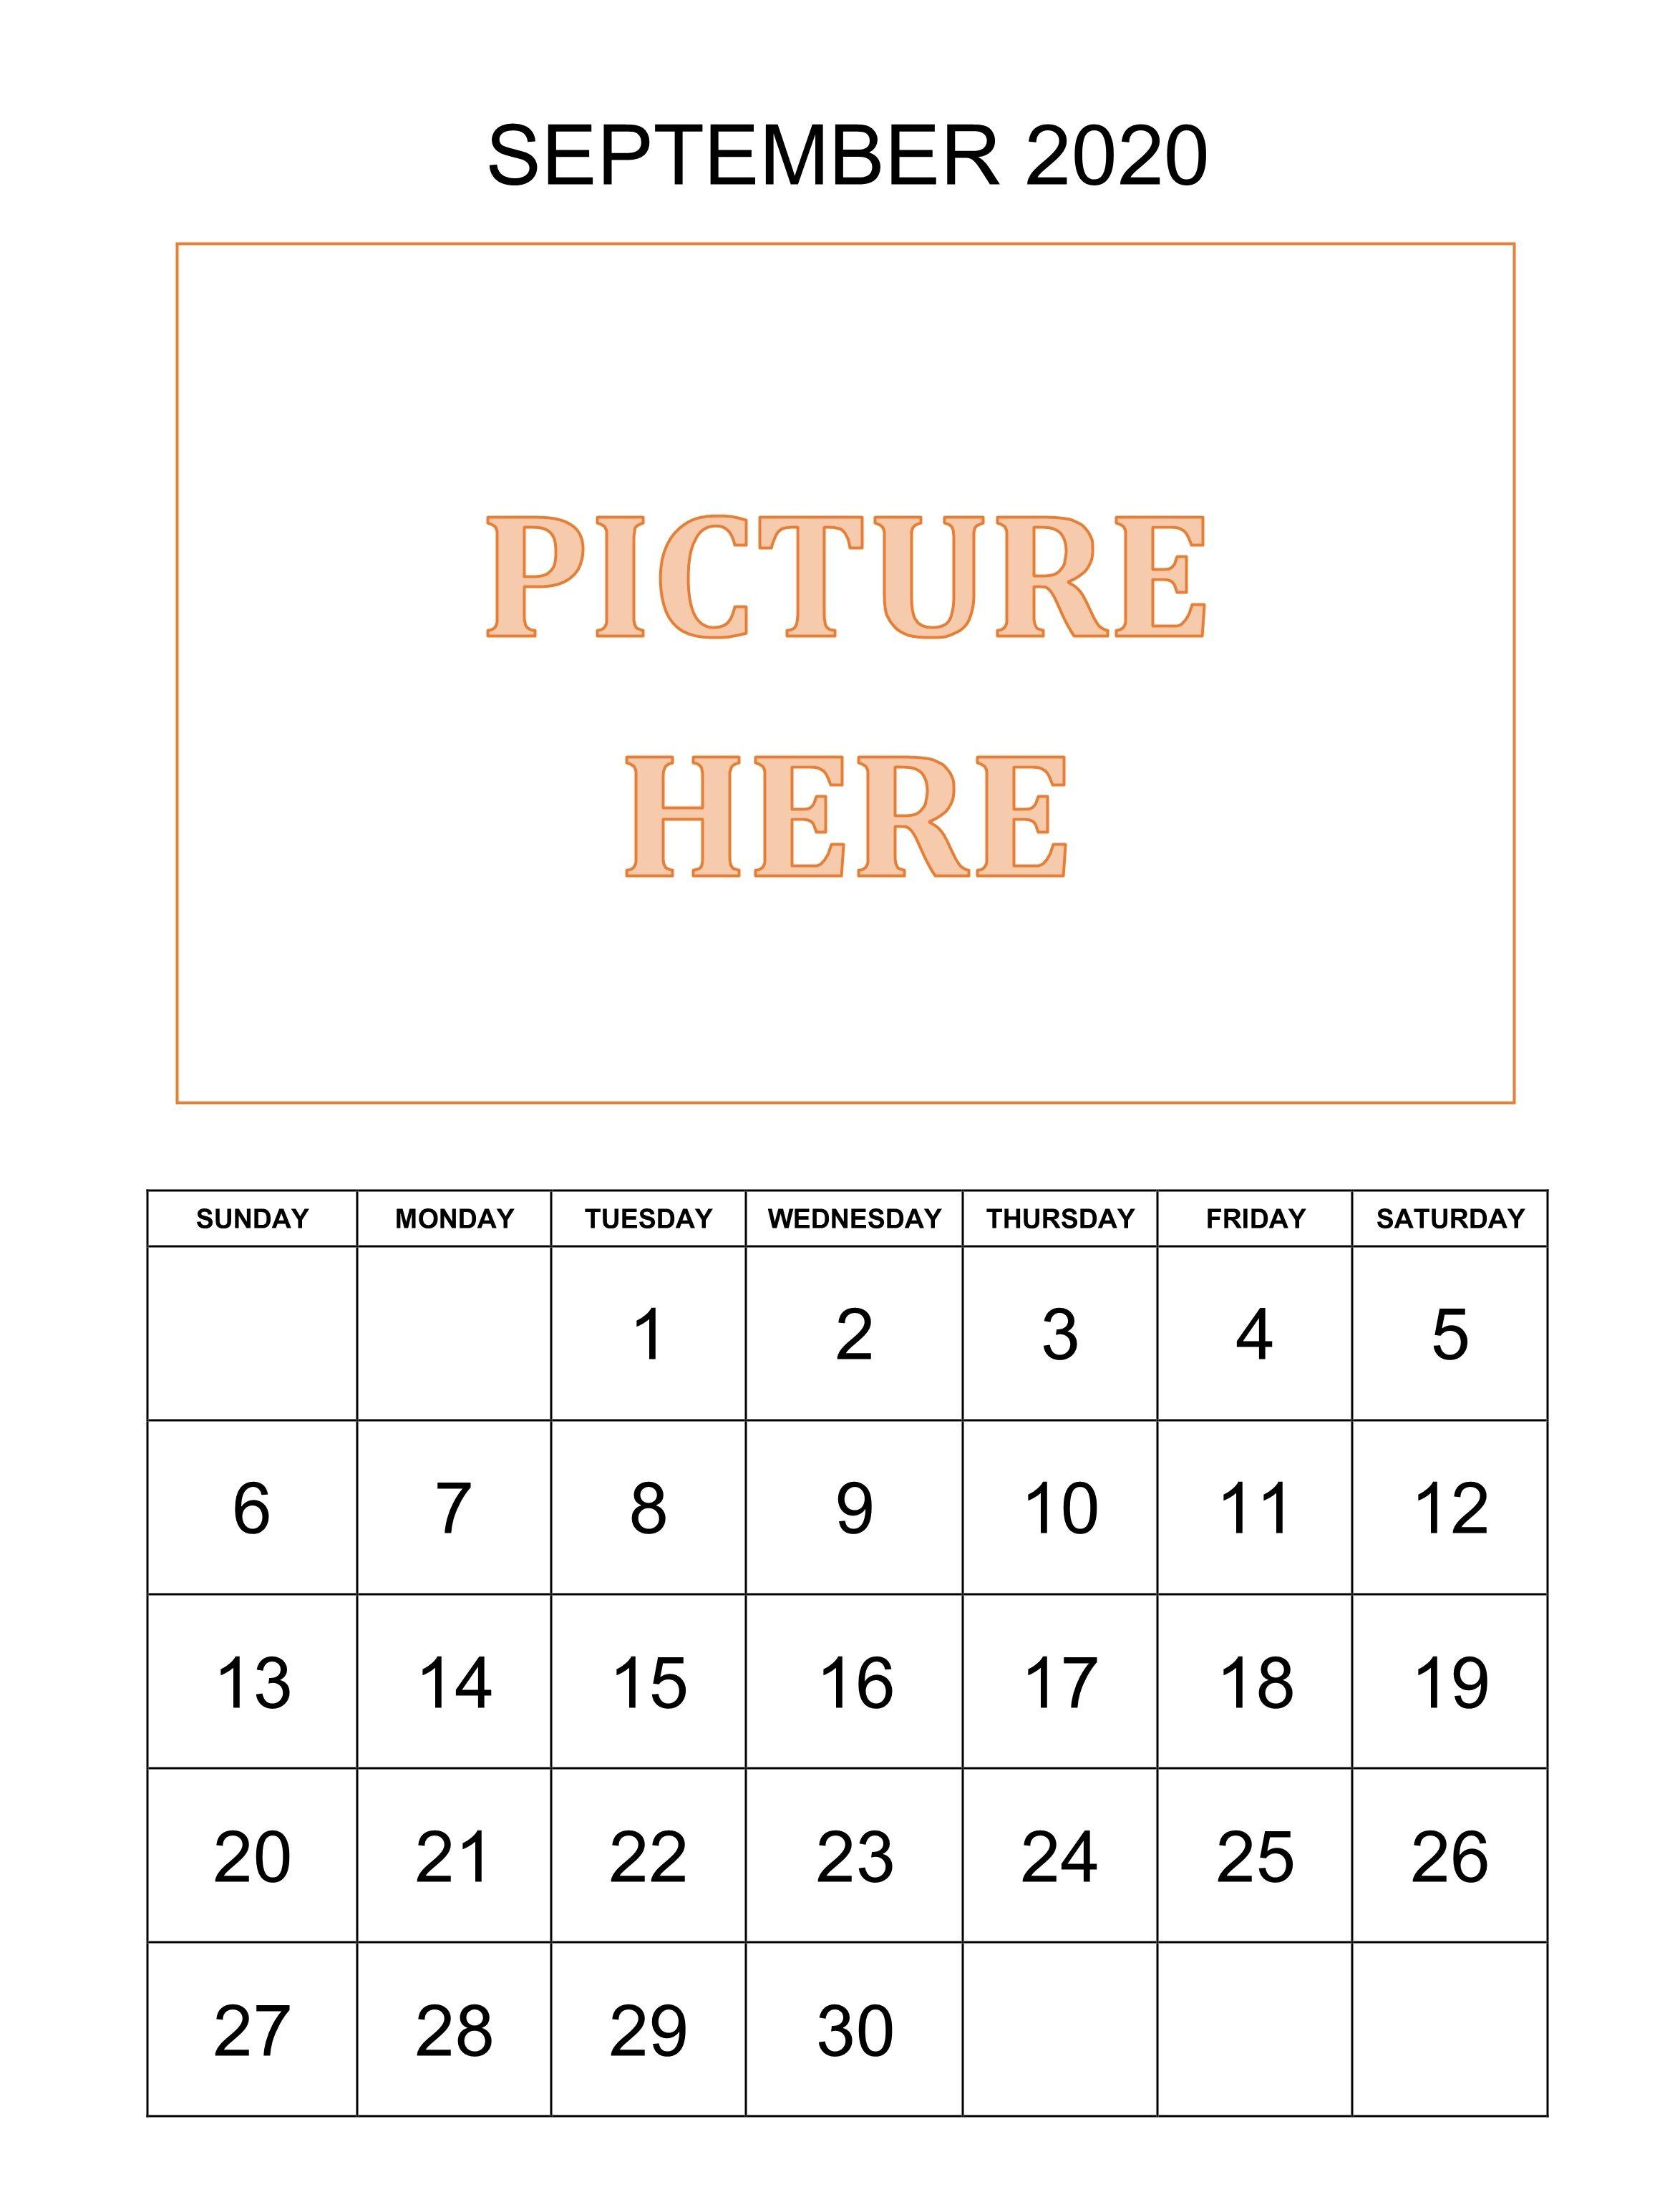 Decorative September Calendar 2020 In 2020 February Calendar Calendar Template Free Printable Calendar Templates